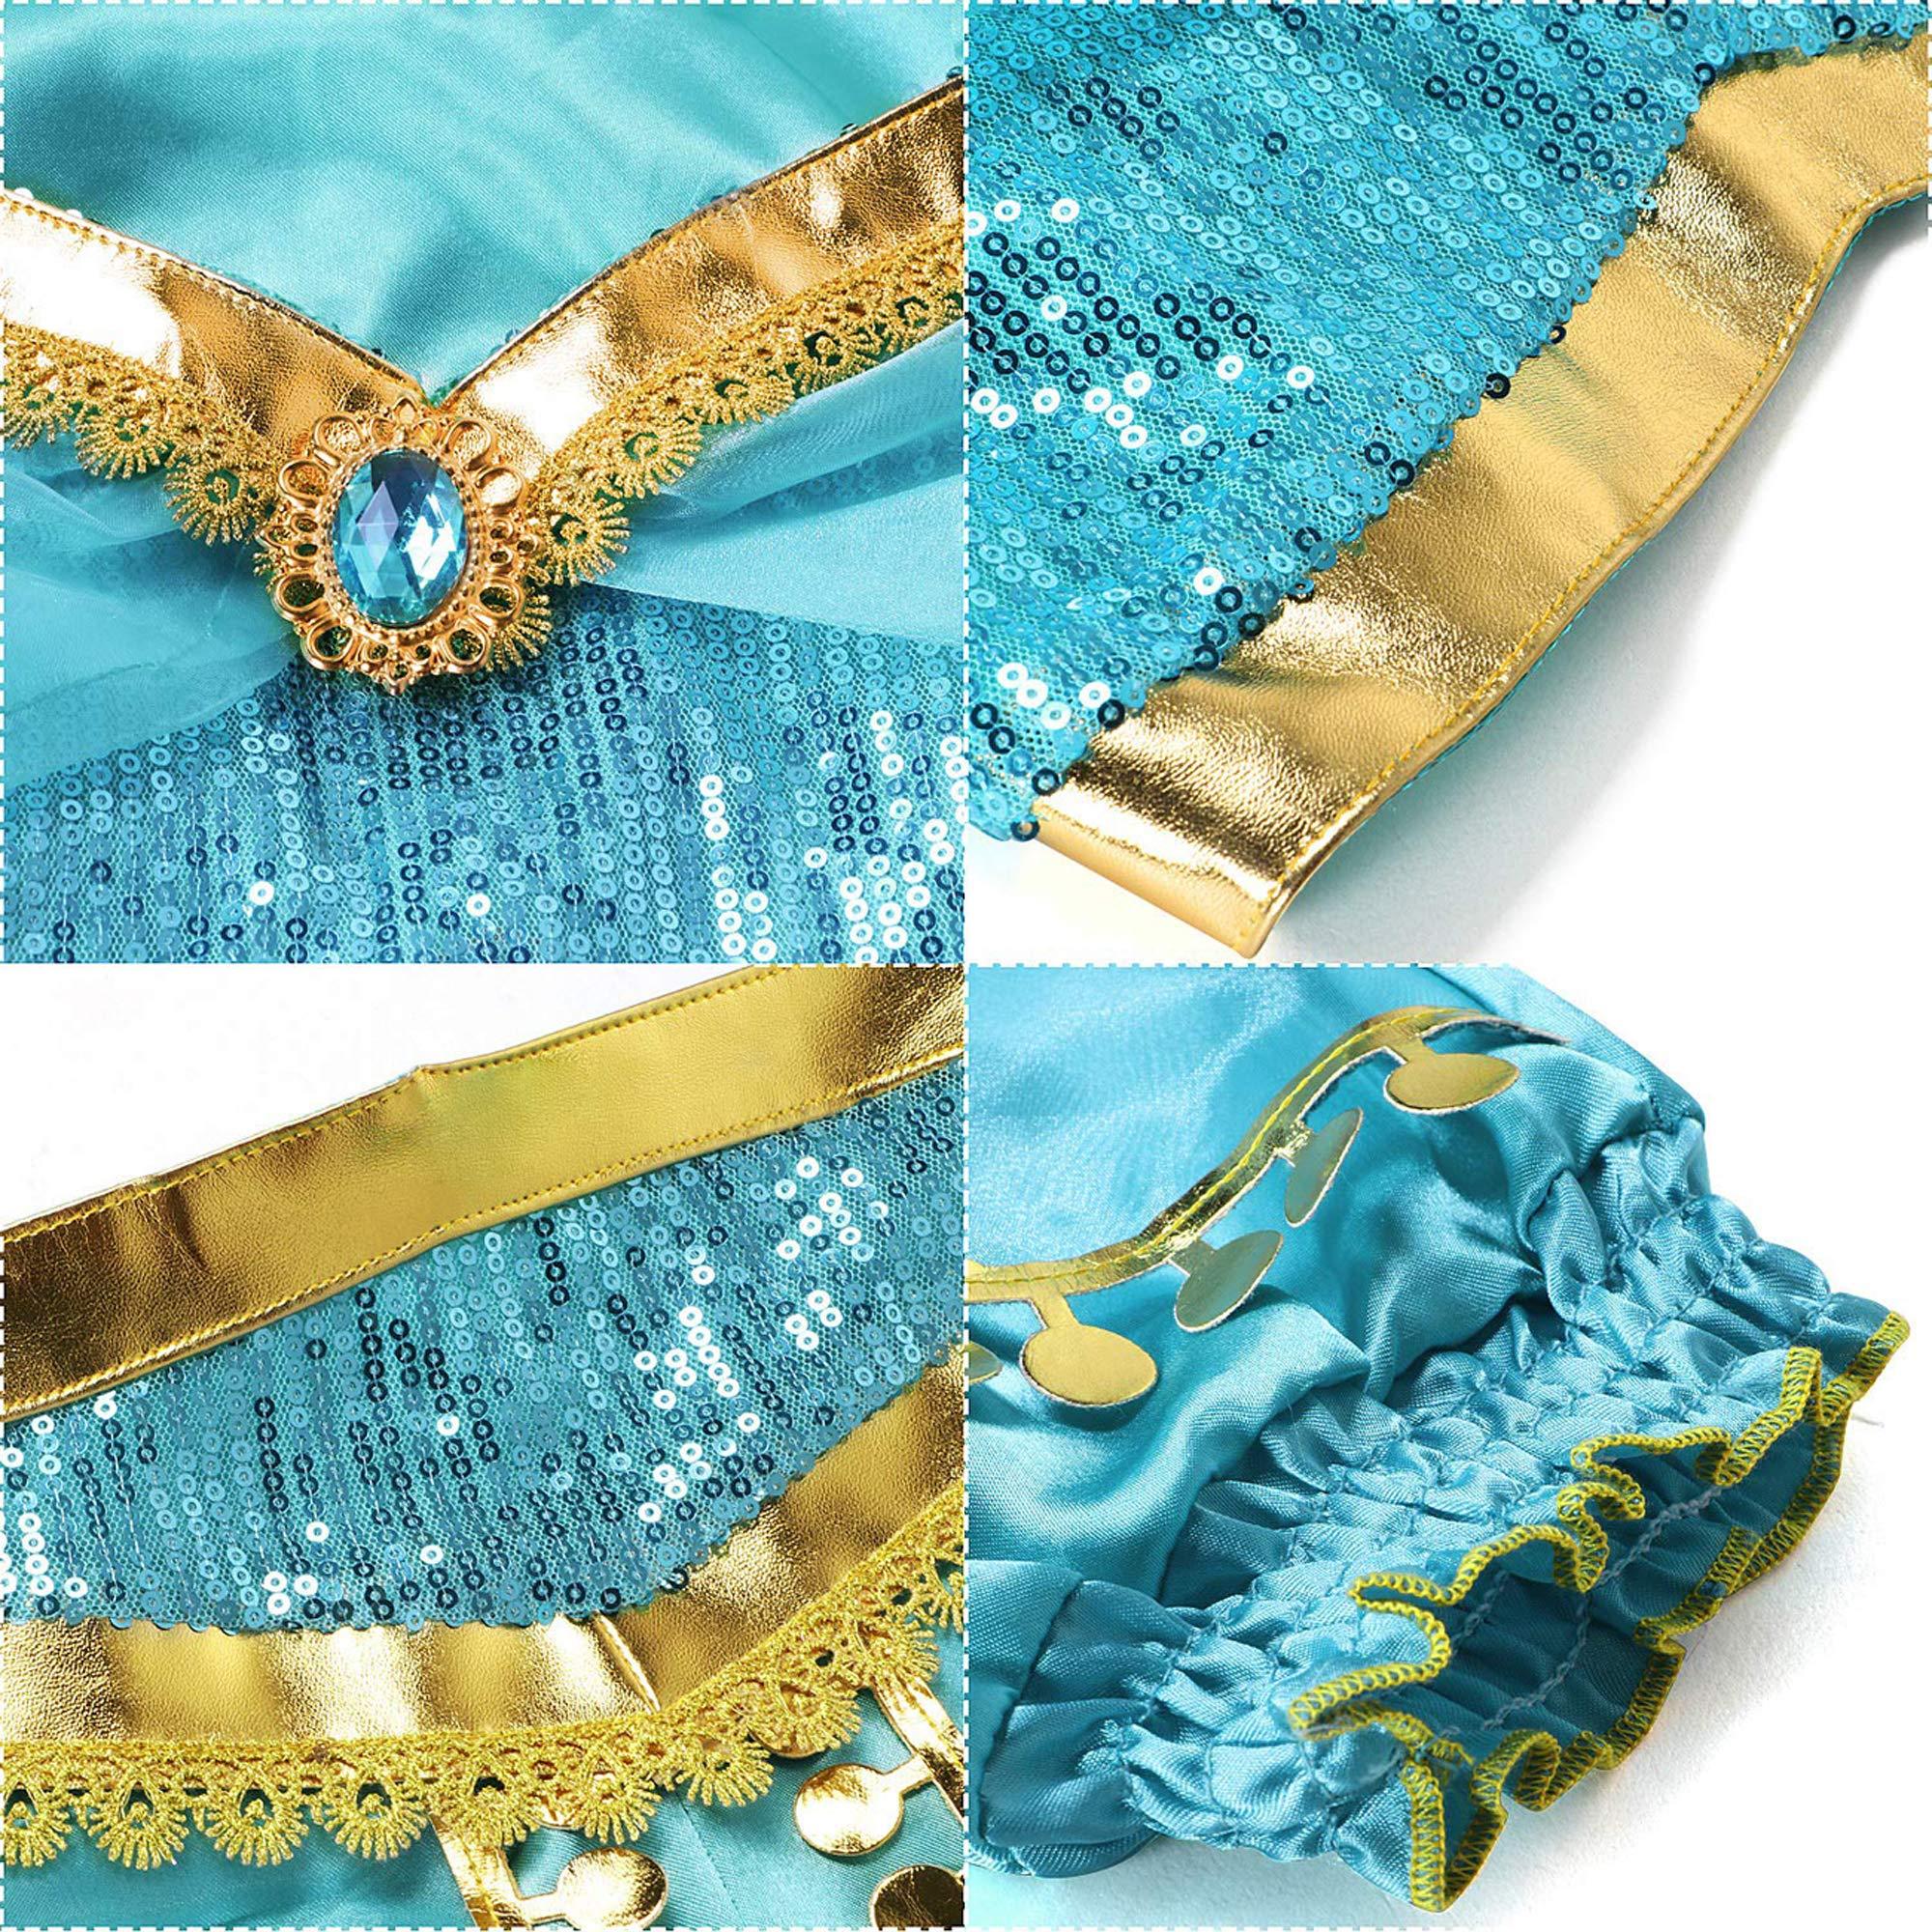 SZ-TONDA Girls Princess Costume Dress Halloween Party Arabian Cosplay Teal /& Gold Outfit for Kid Child Teen